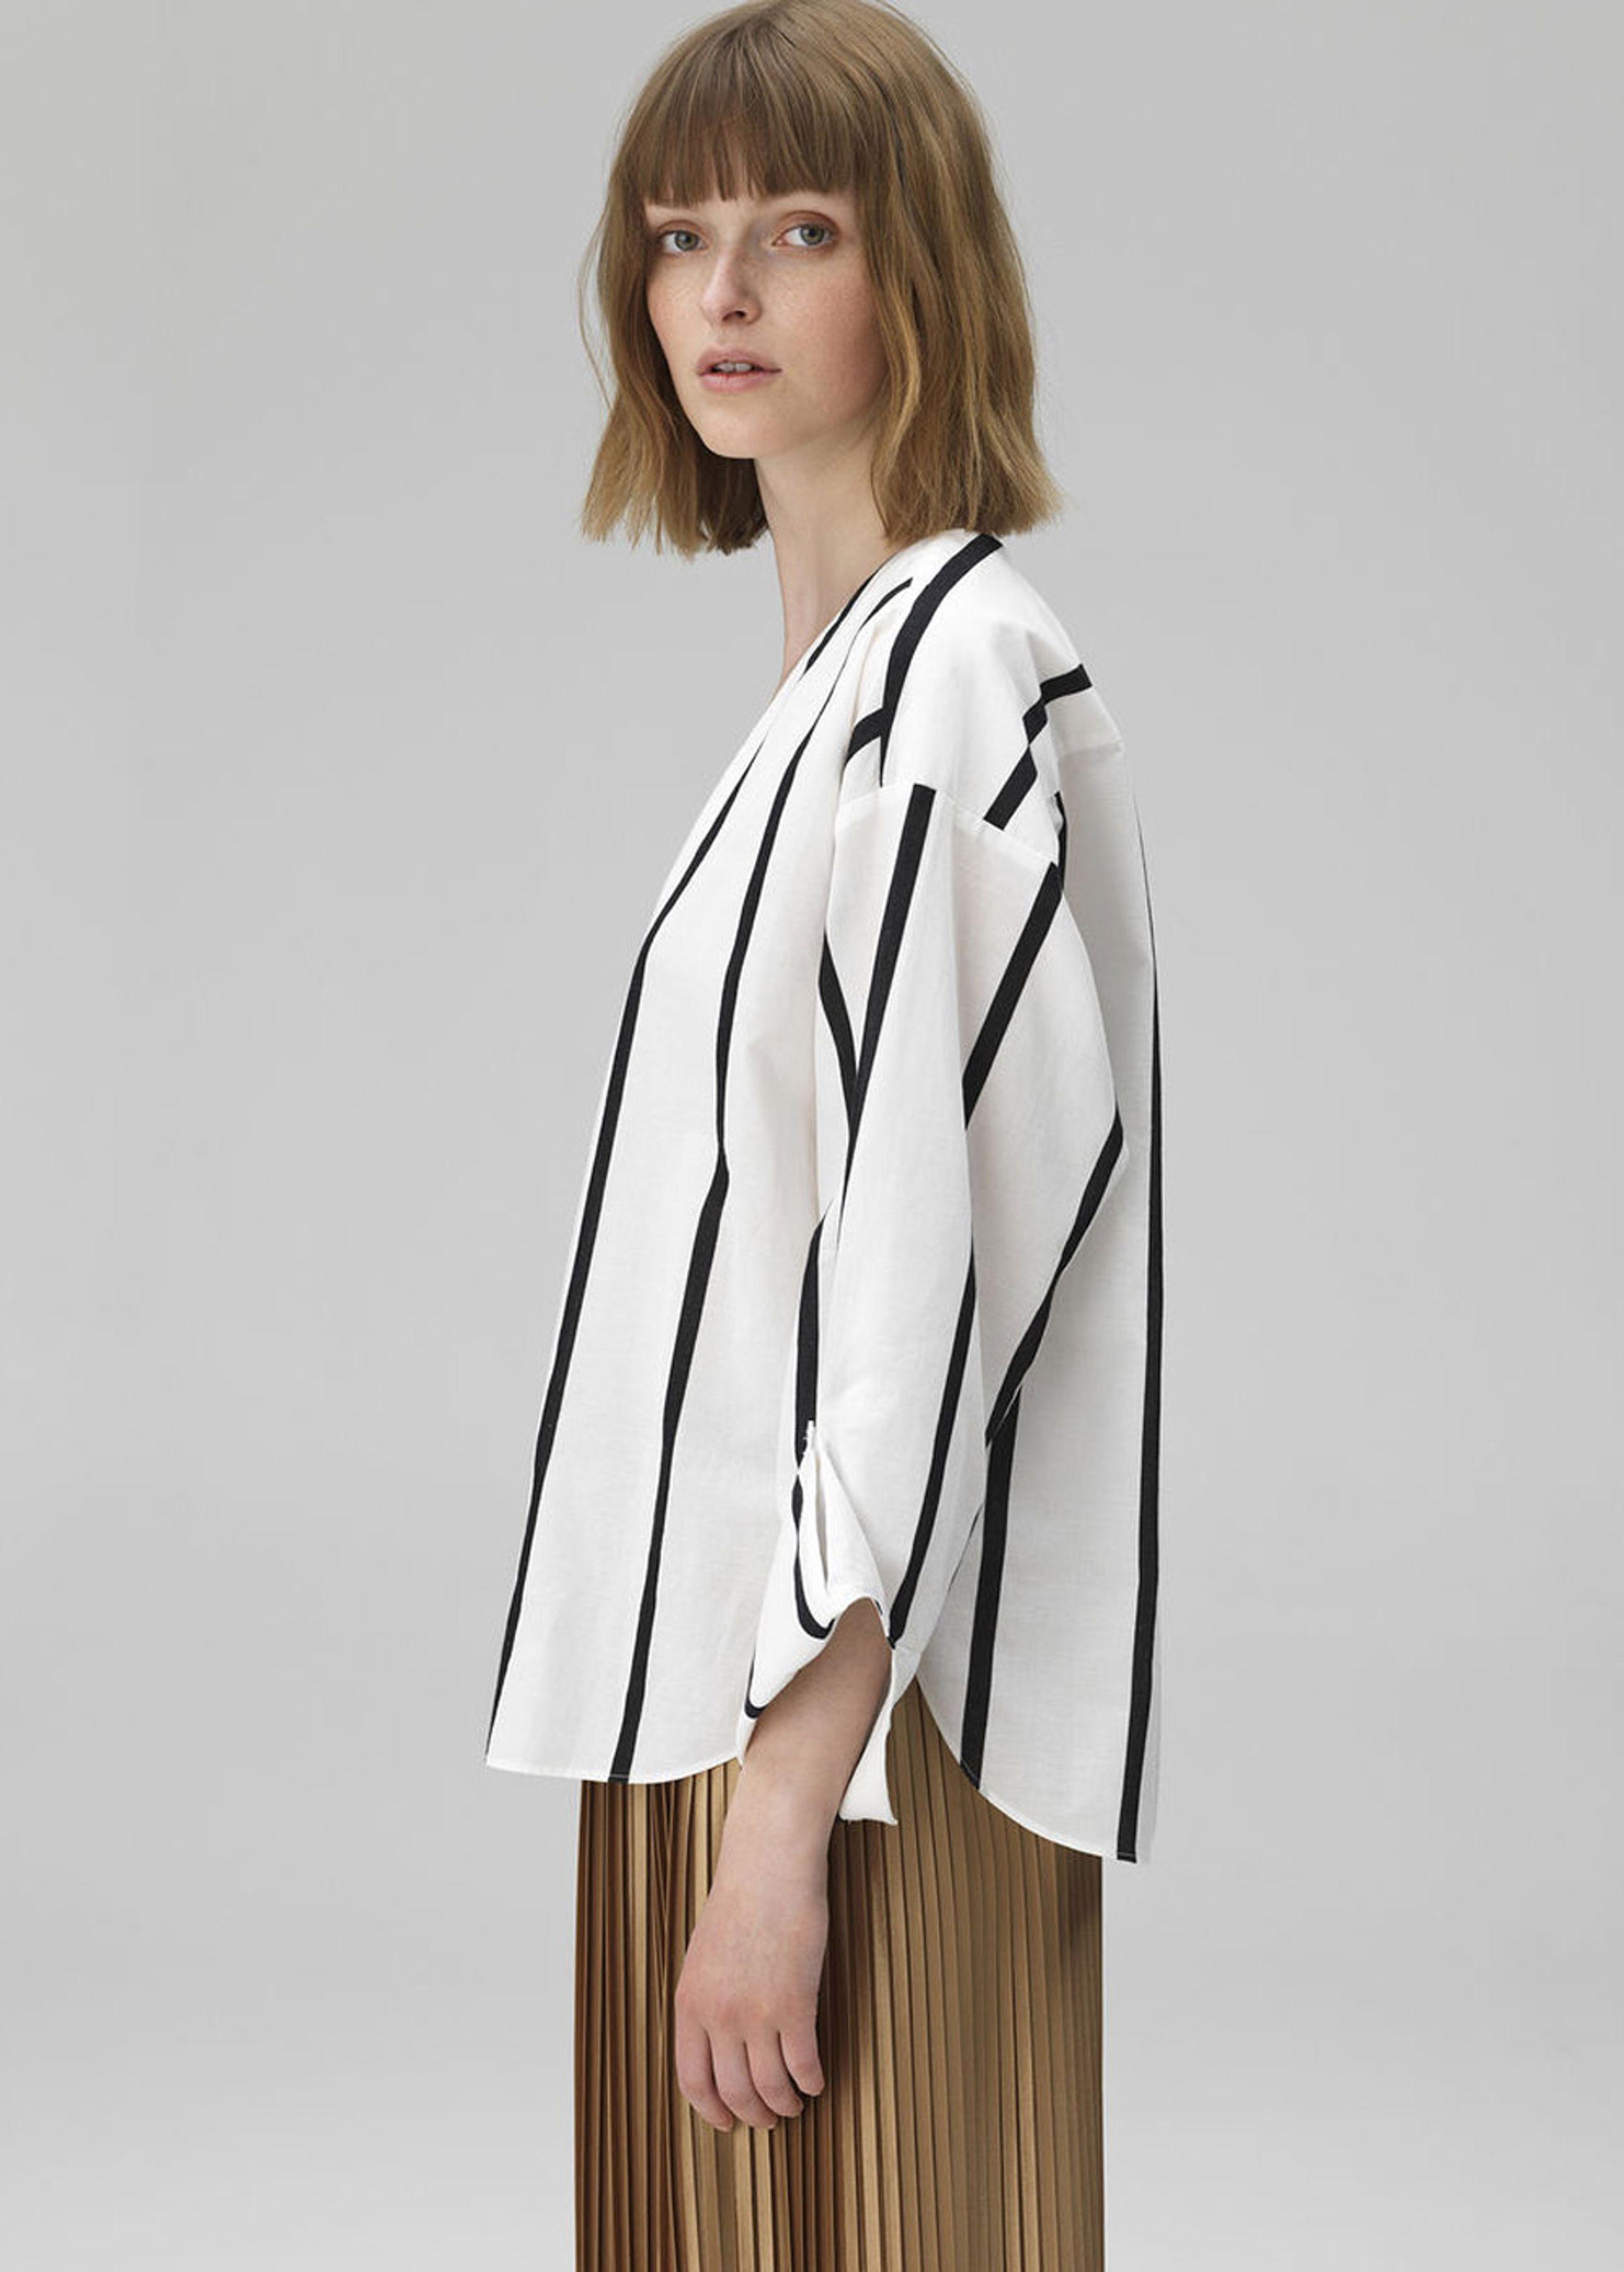 766afbff302 ... By Malene Birger - Bluse - Bobinoh - Black/White Stripe